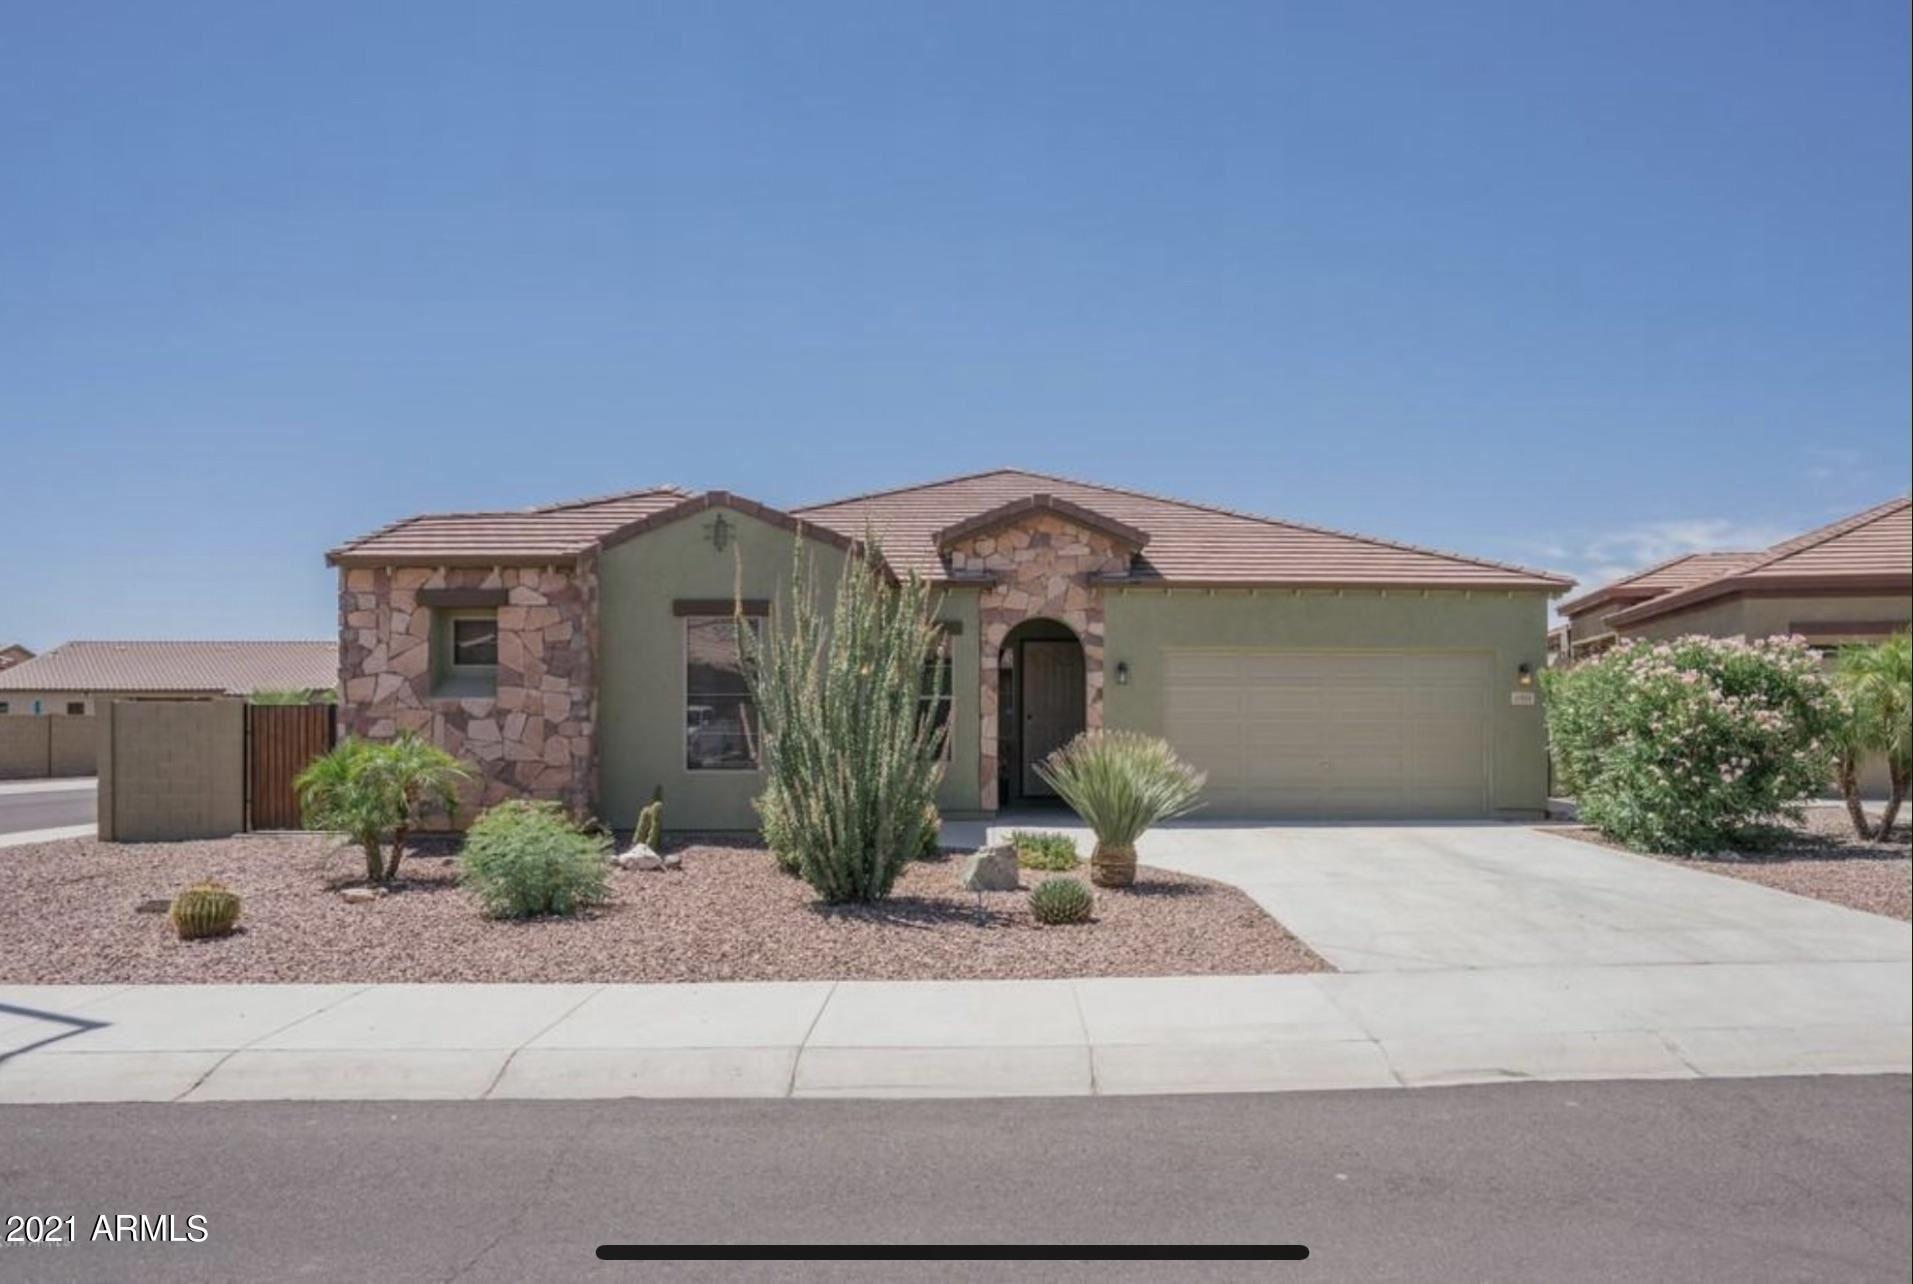 Photo of 11941 W VILLA HERMOSA Lane, Sun City, AZ 85373 (MLS # 6200415)